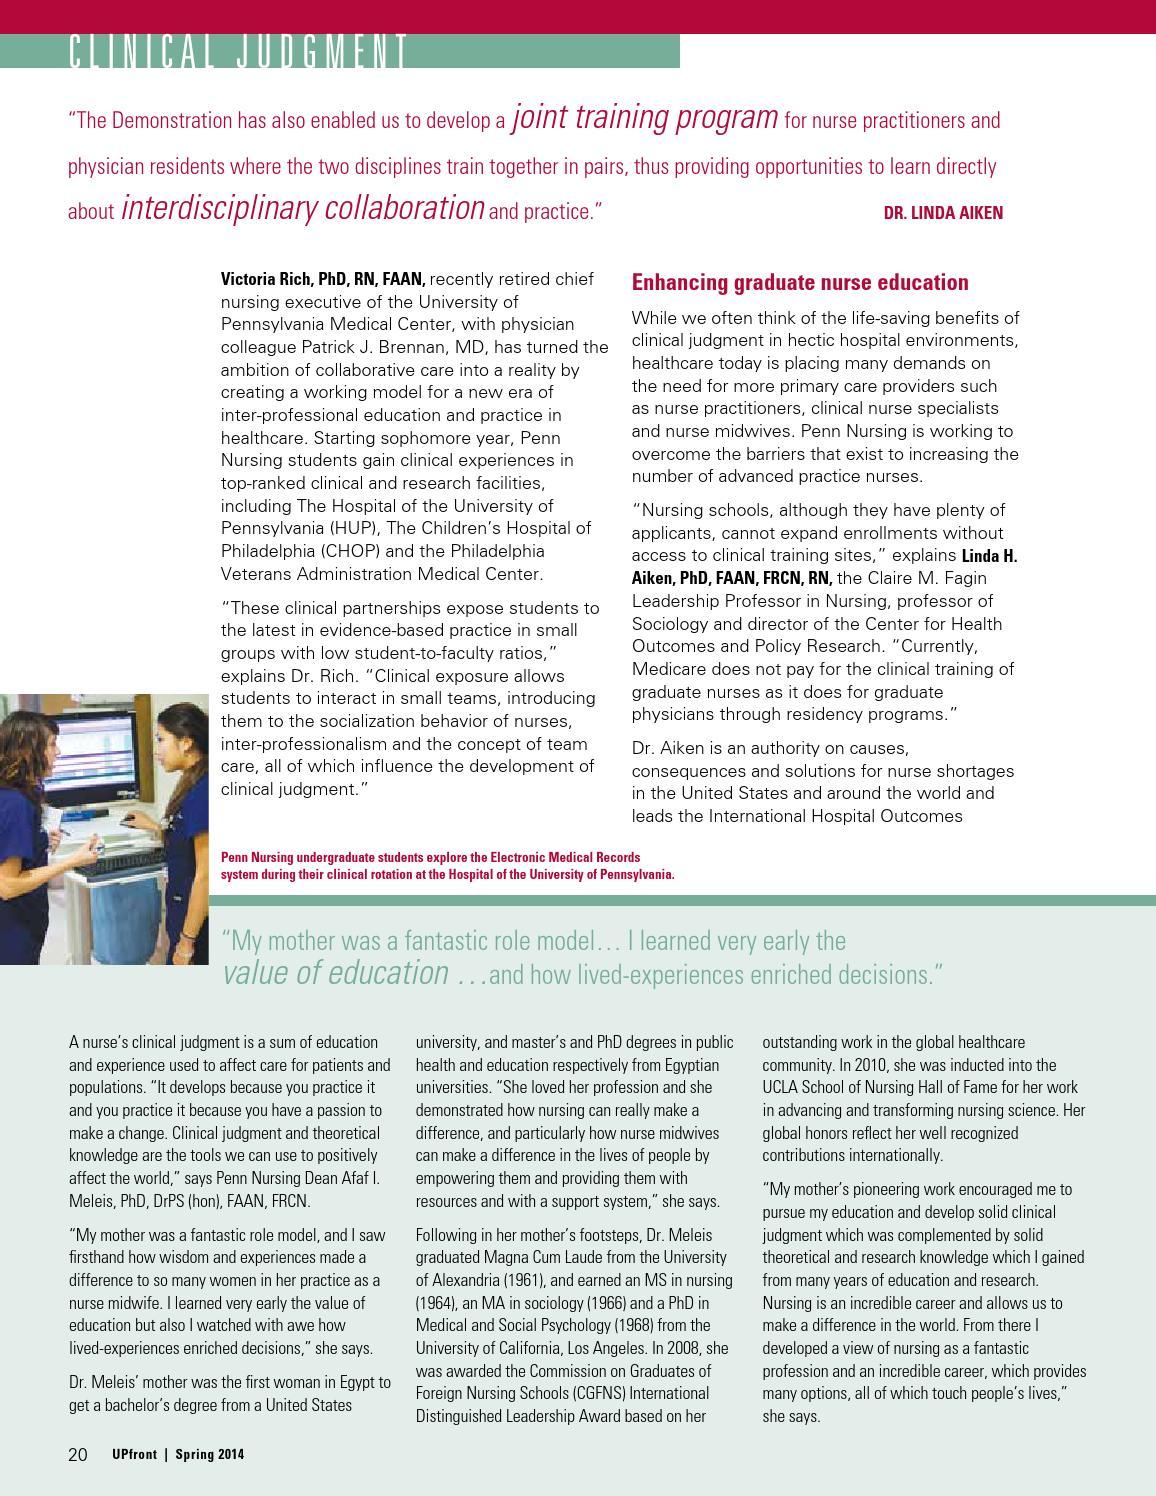 Penn Nursing UPfront: Spring 2014 by PennNursing - issuu